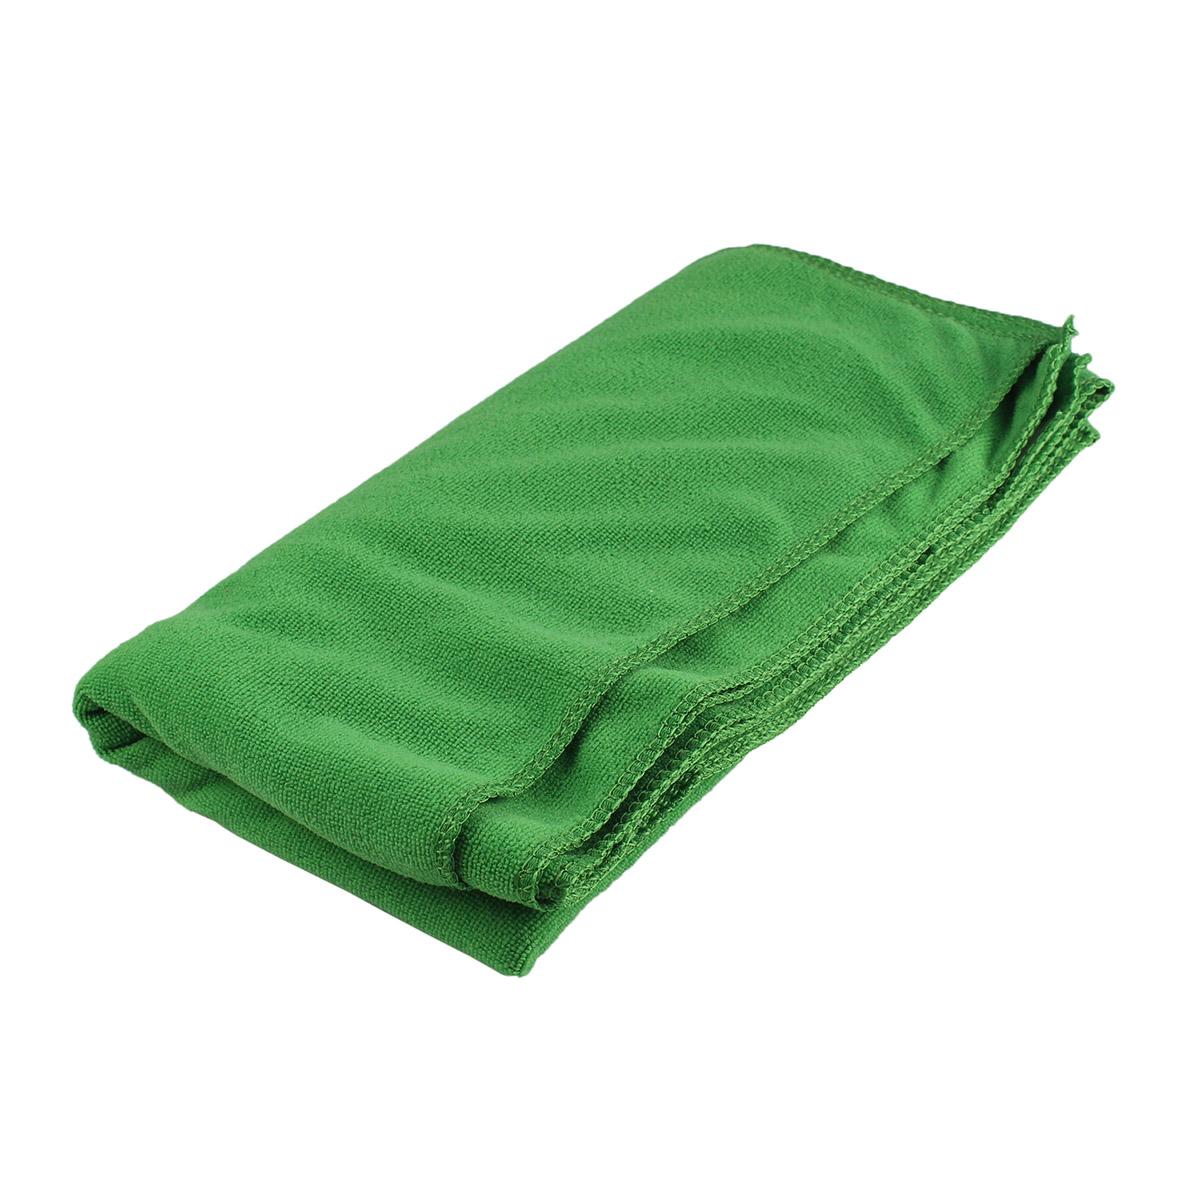 Microfiber Bath Towels For Camping: Soft Microfiber Fast Drying Bath Beach Towel Camping High